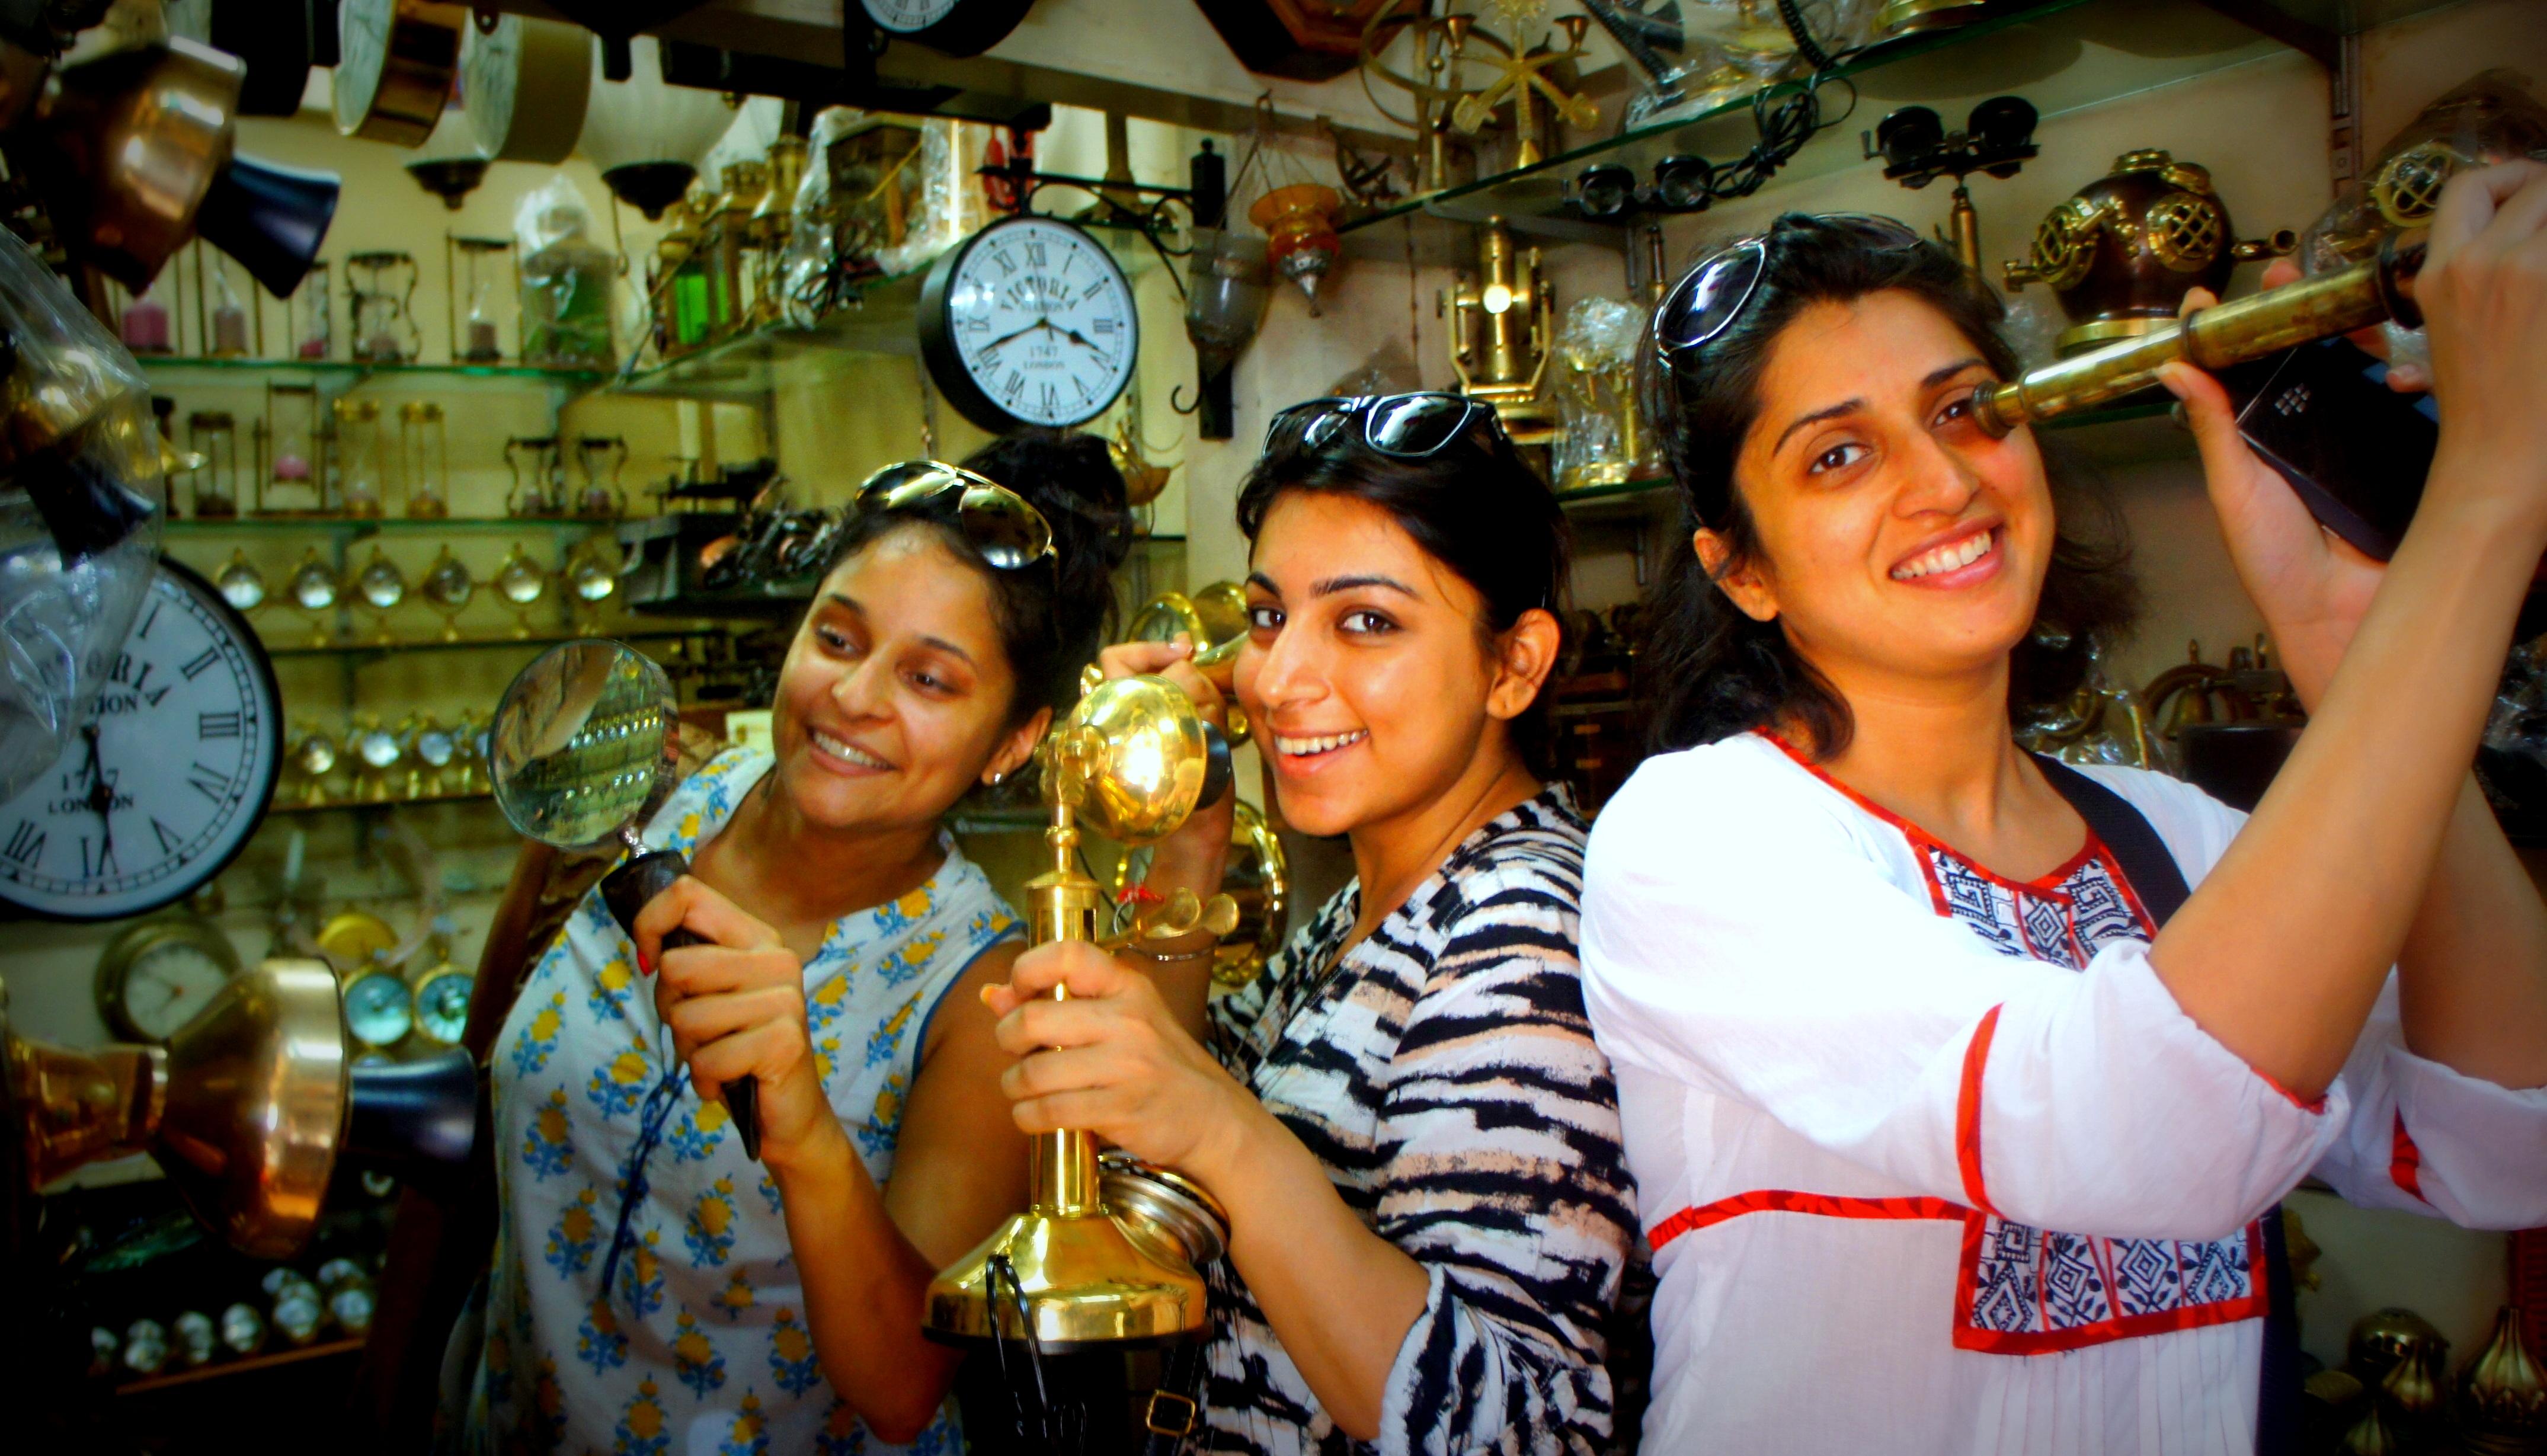 Cb Chor Bazaar Pictures